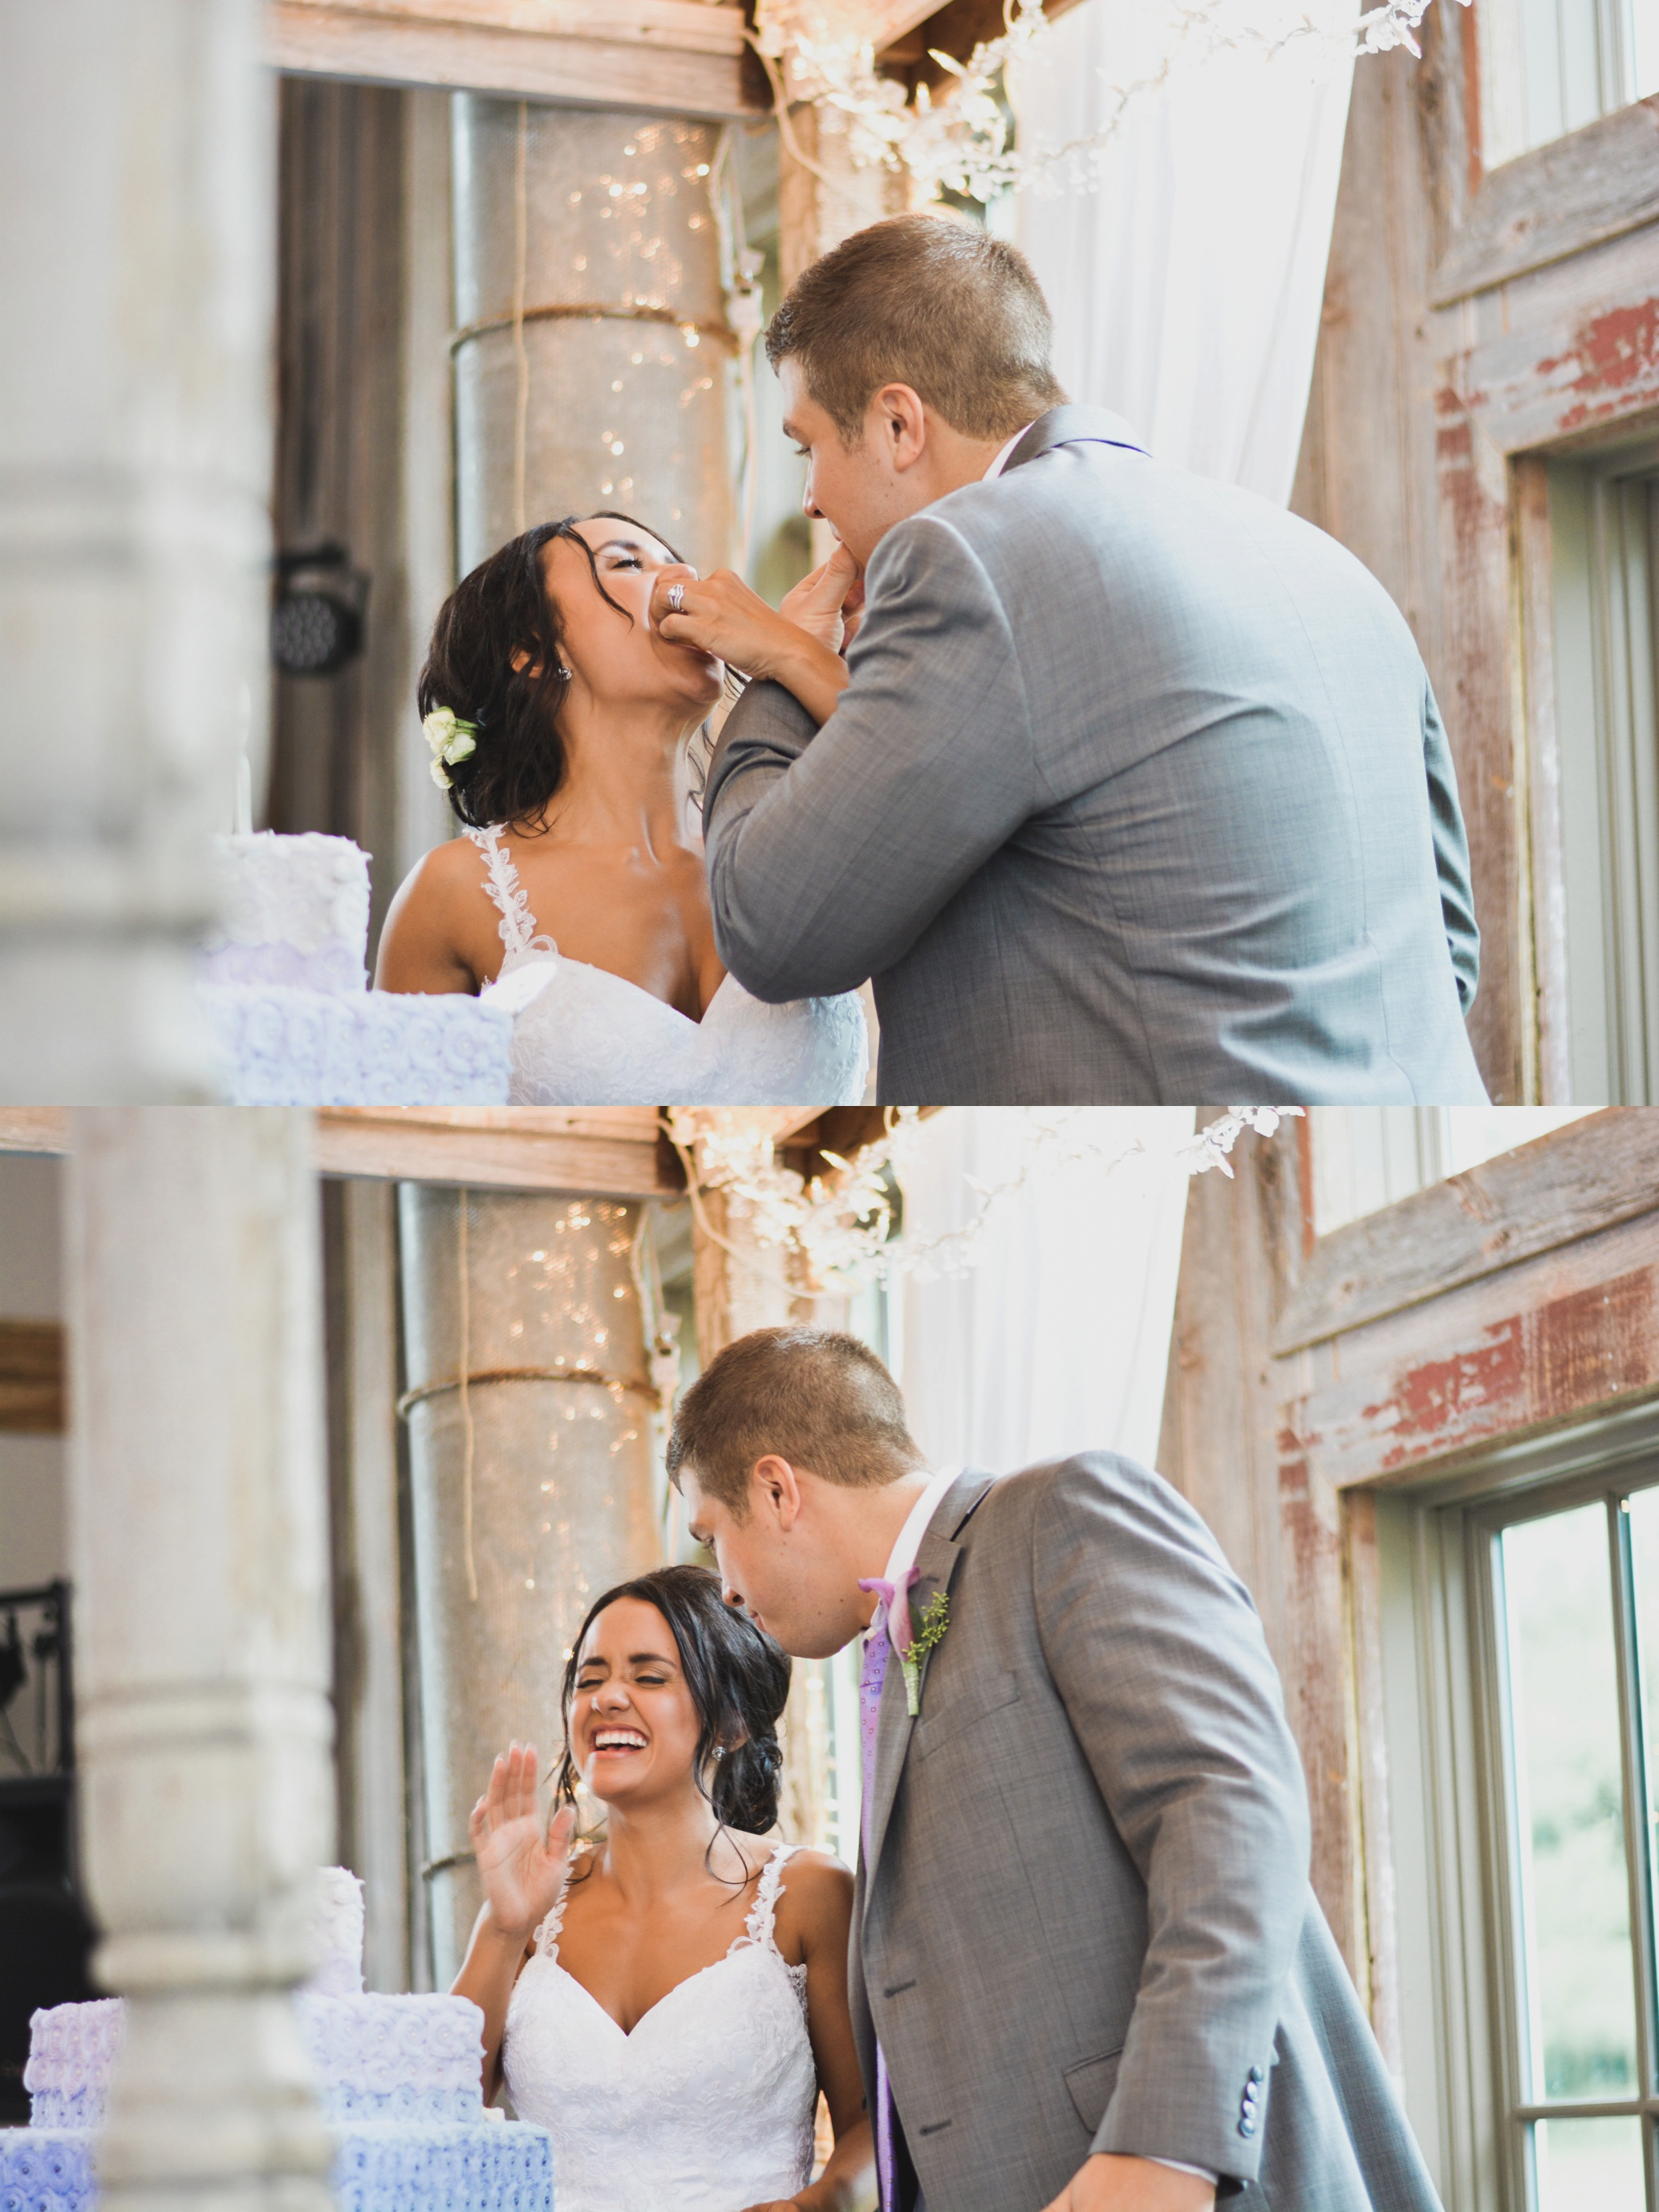 Barnes' Place Rustic Outdoor Wedding | Ali Leigh Photo Minneapolis Wedding Photographer_0136.jpg